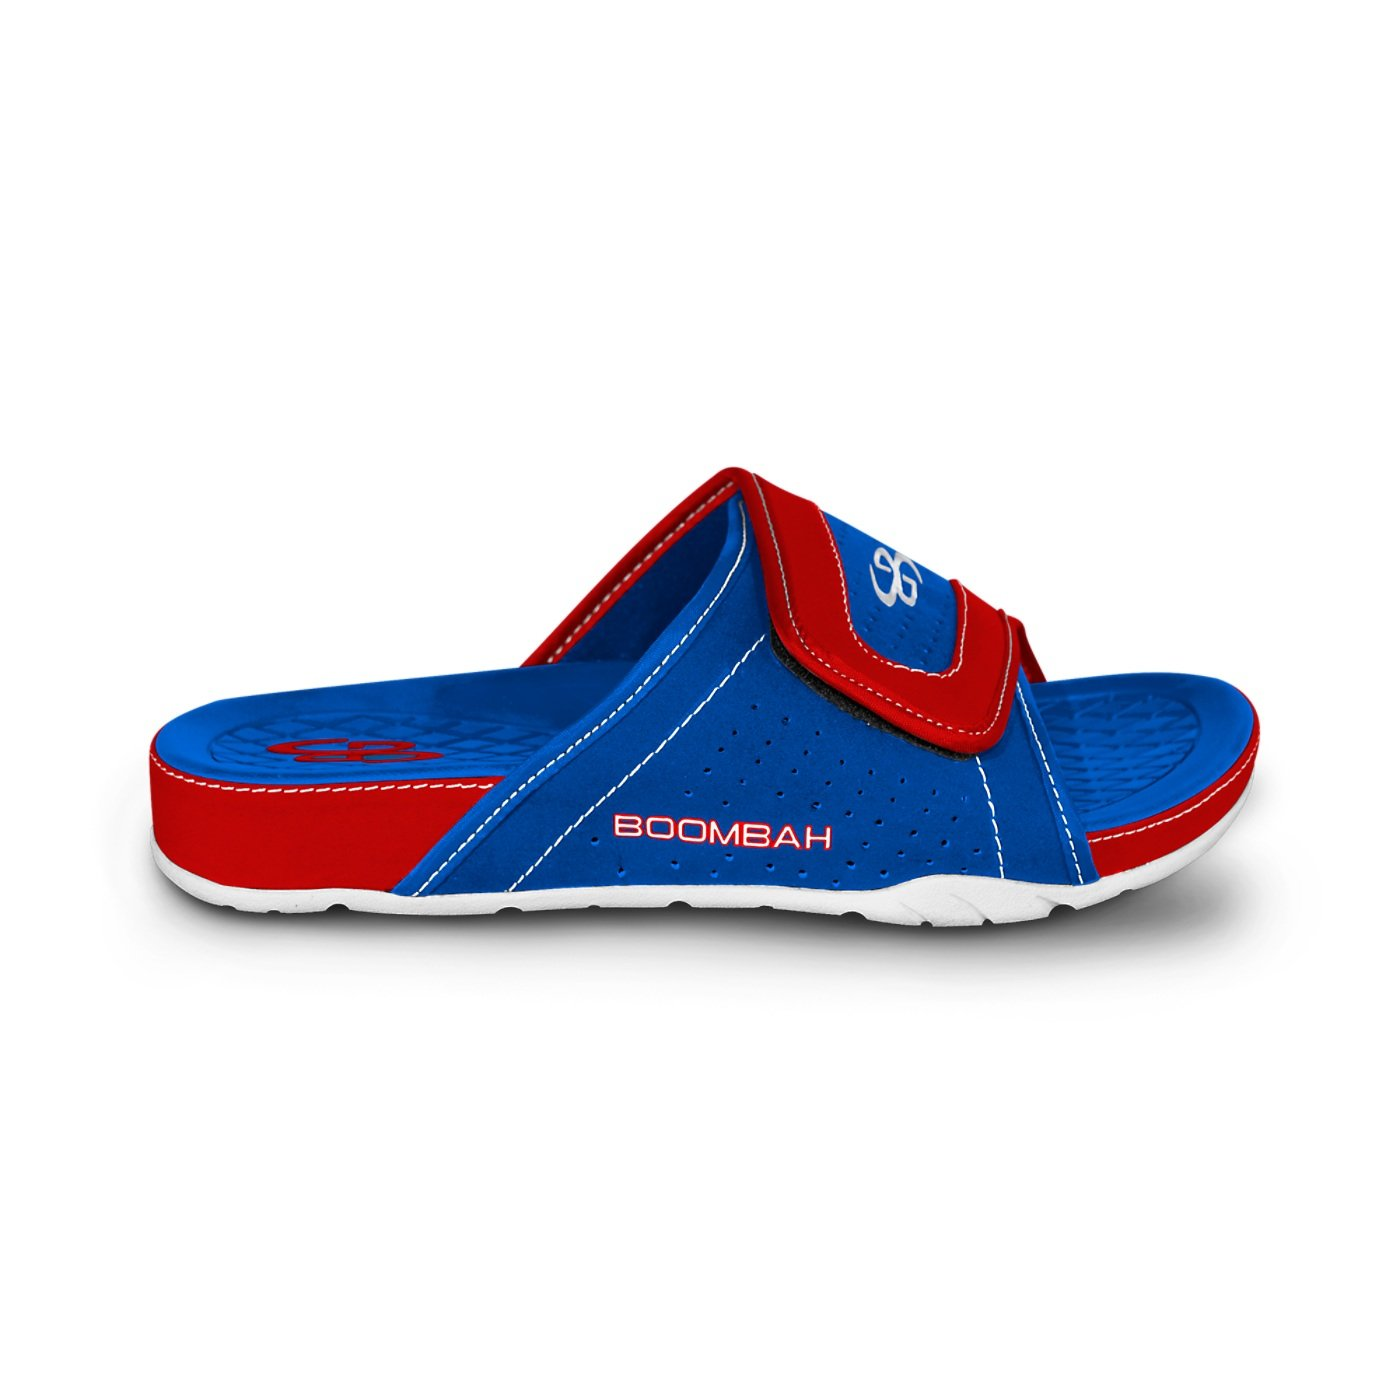 Boombah Men's Tyrant Slide Sandals - 32 Color Options - Multiple Sizes B077NKPMNK 13 Royal/Red